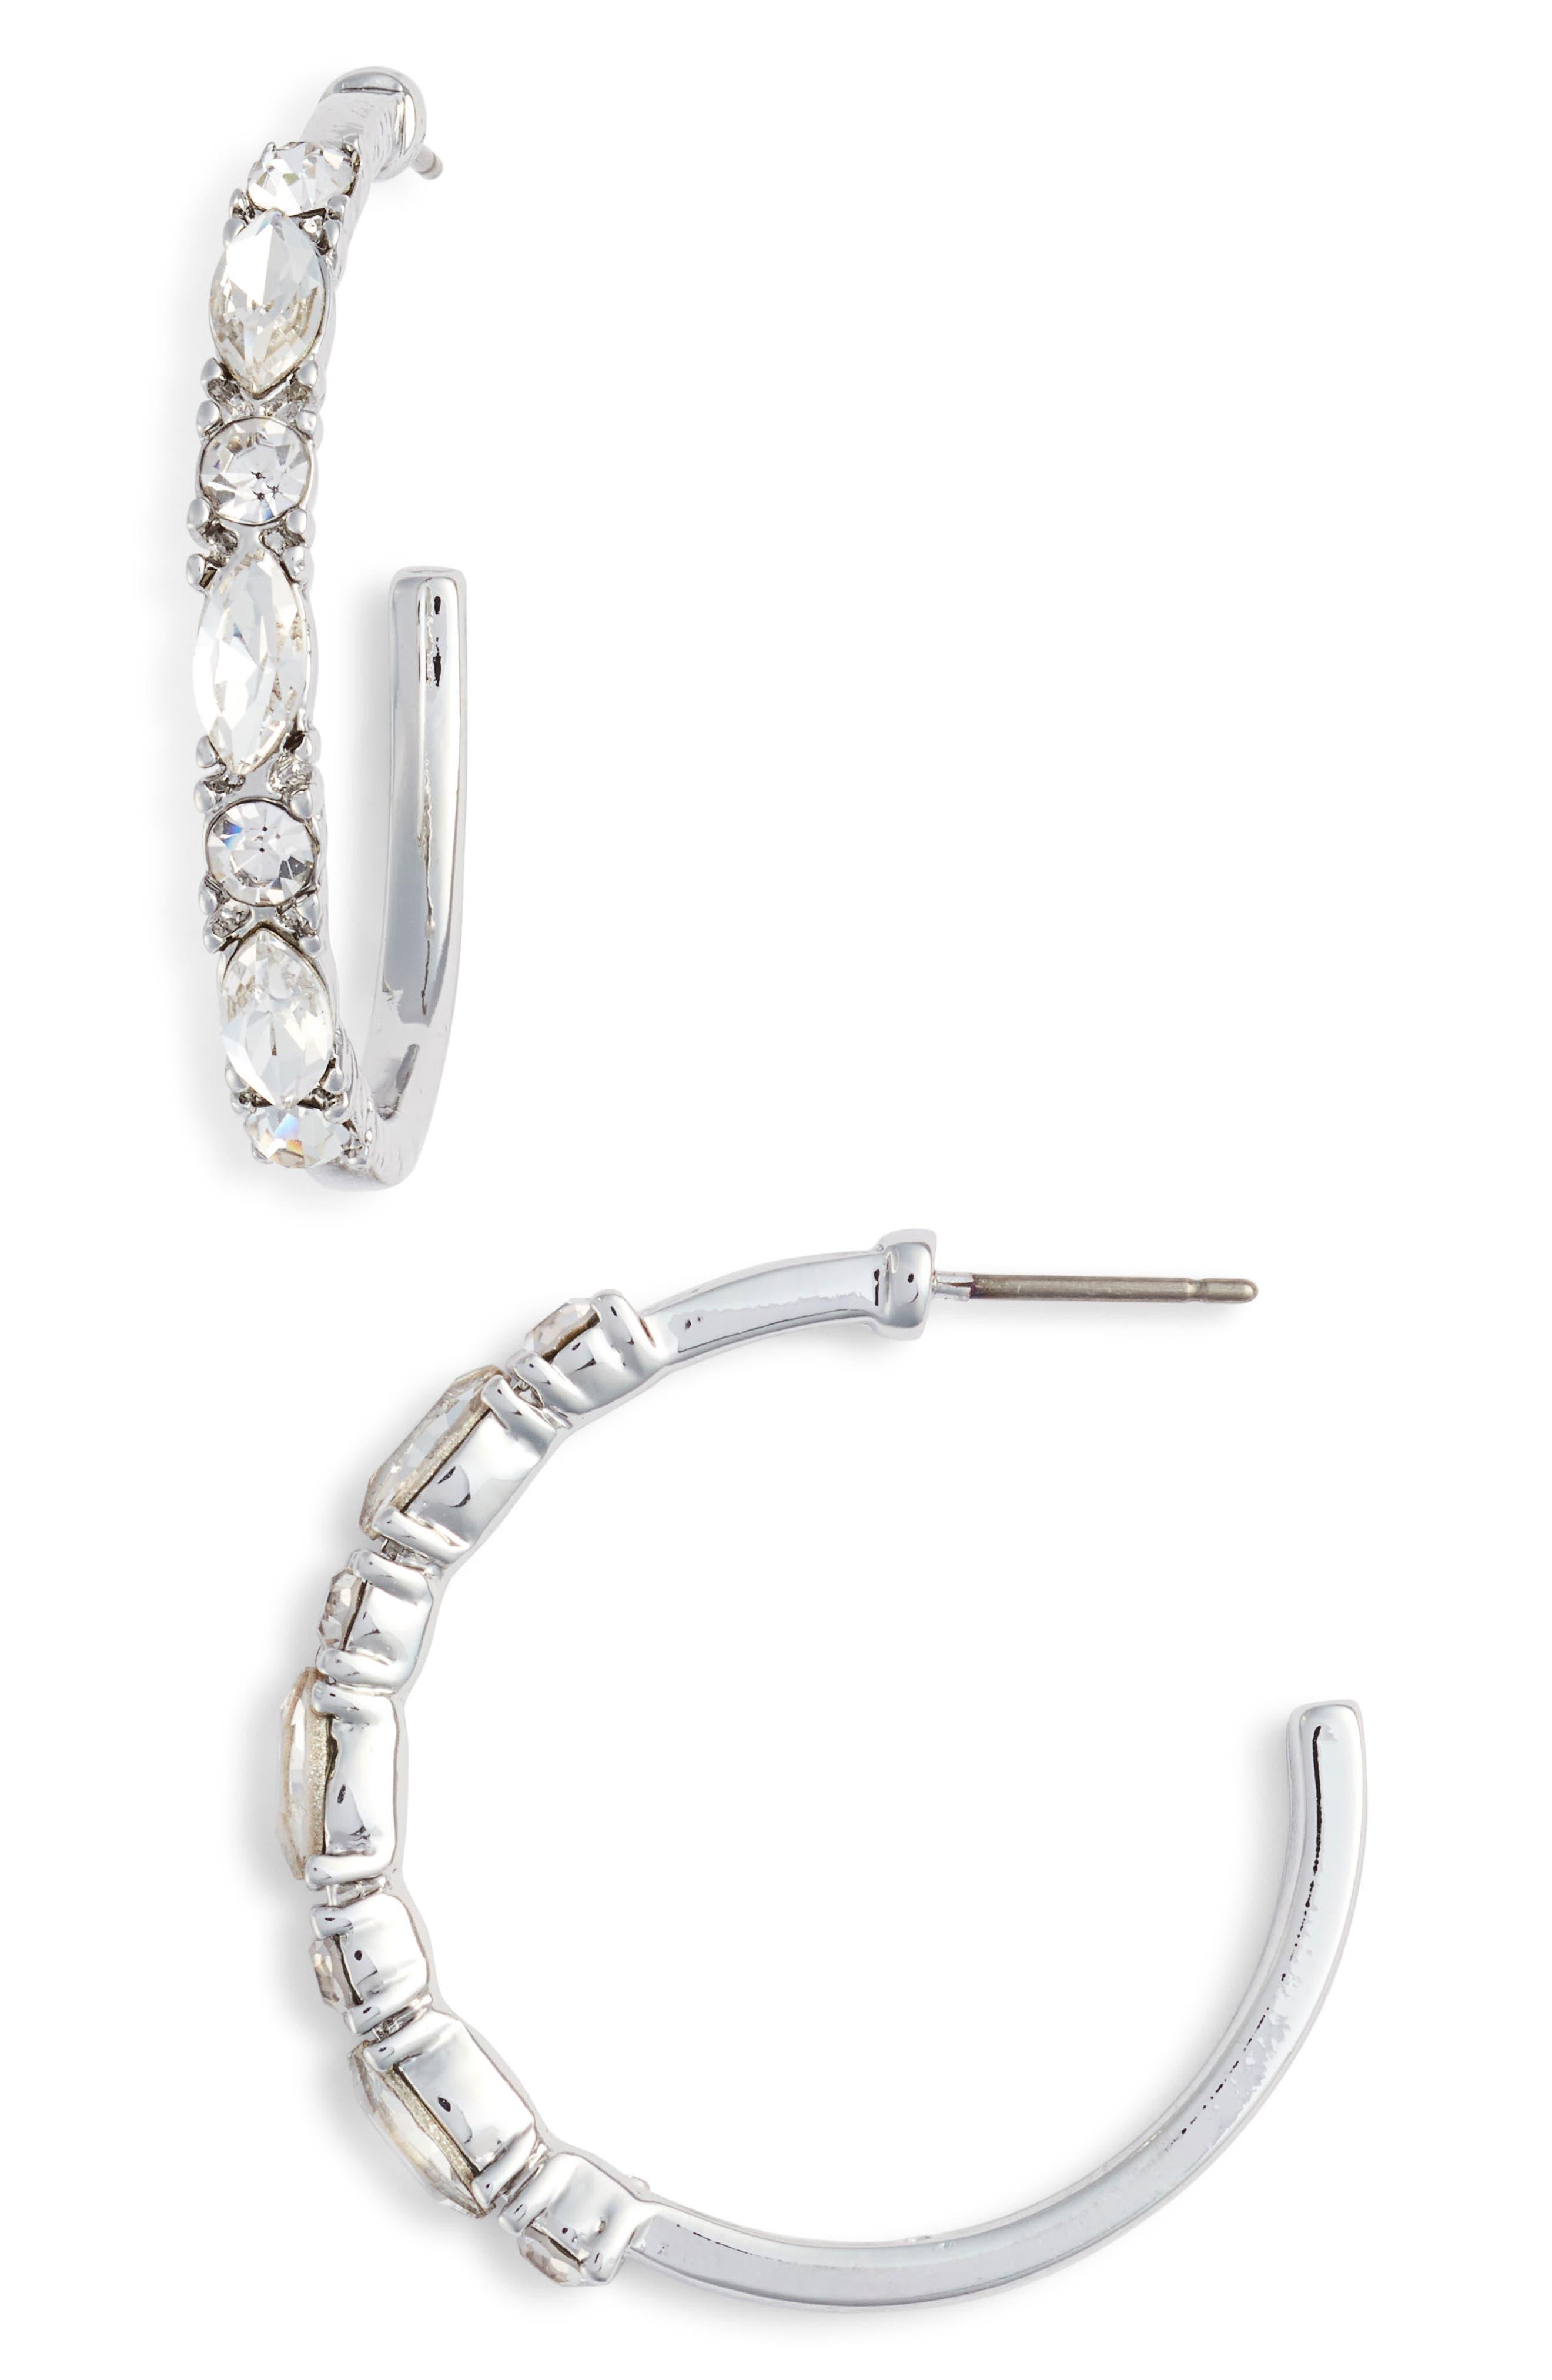 Crystal Hoop Earrings,                             Main thumbnail 1, color,                             SILVER